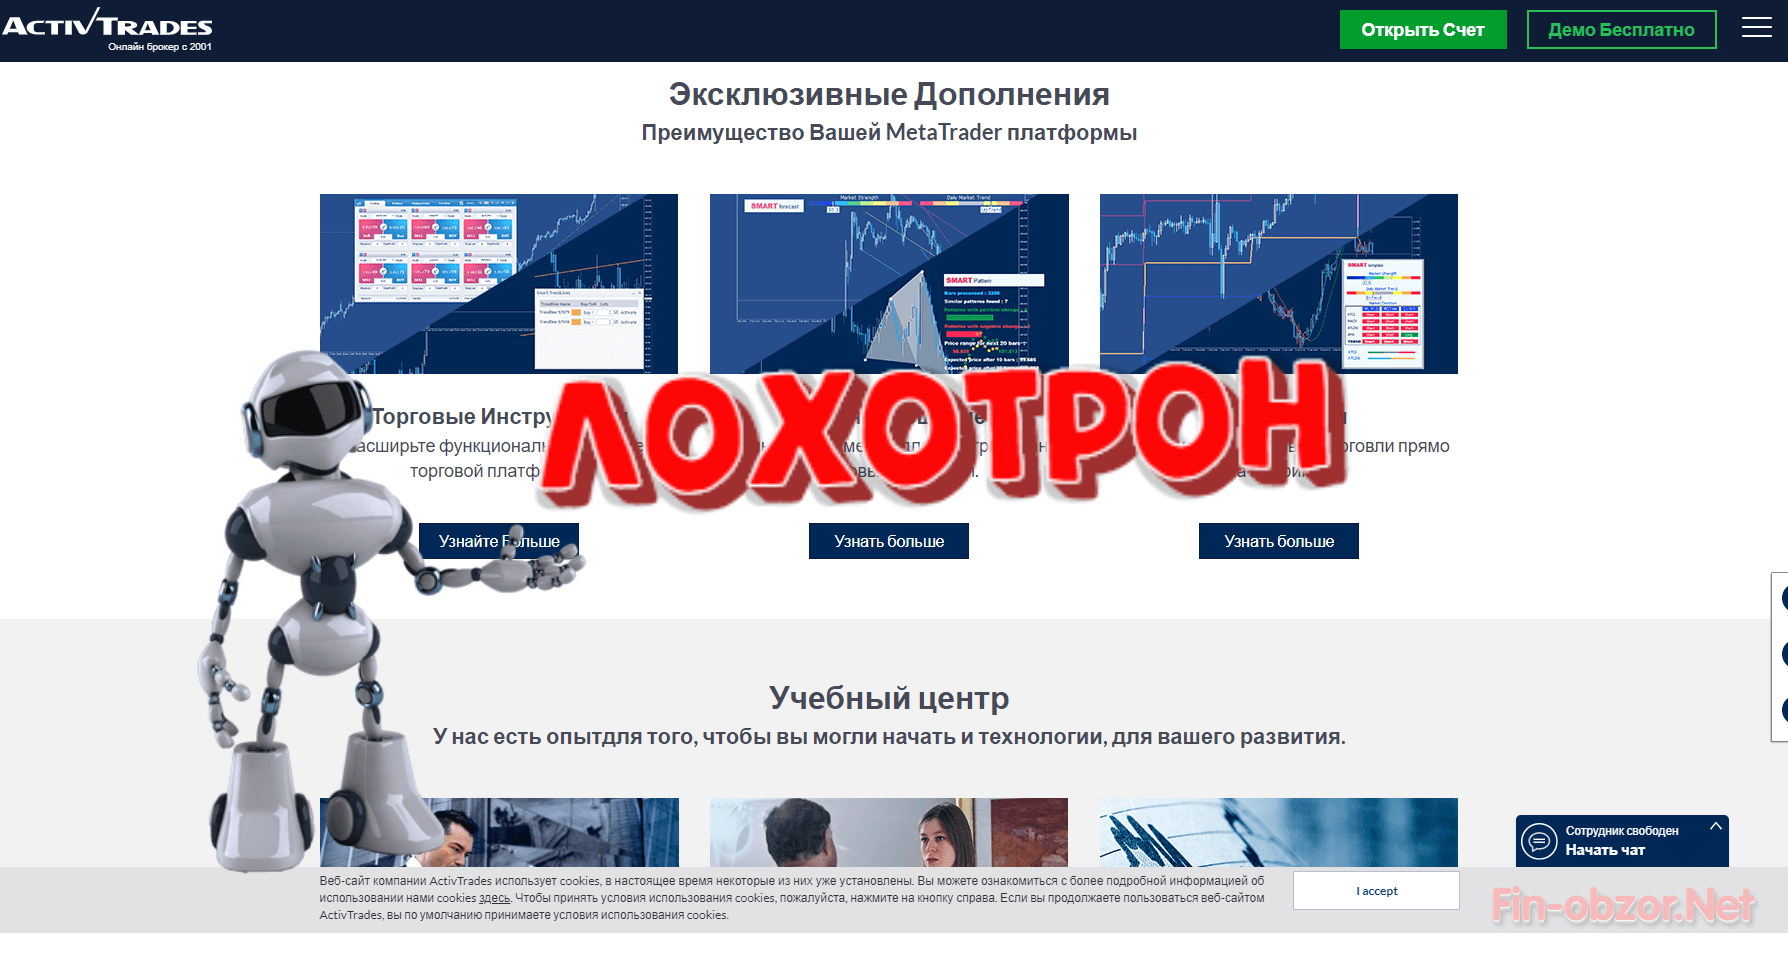 ActivTrades - отзывы и репутация брокера activtrades.com